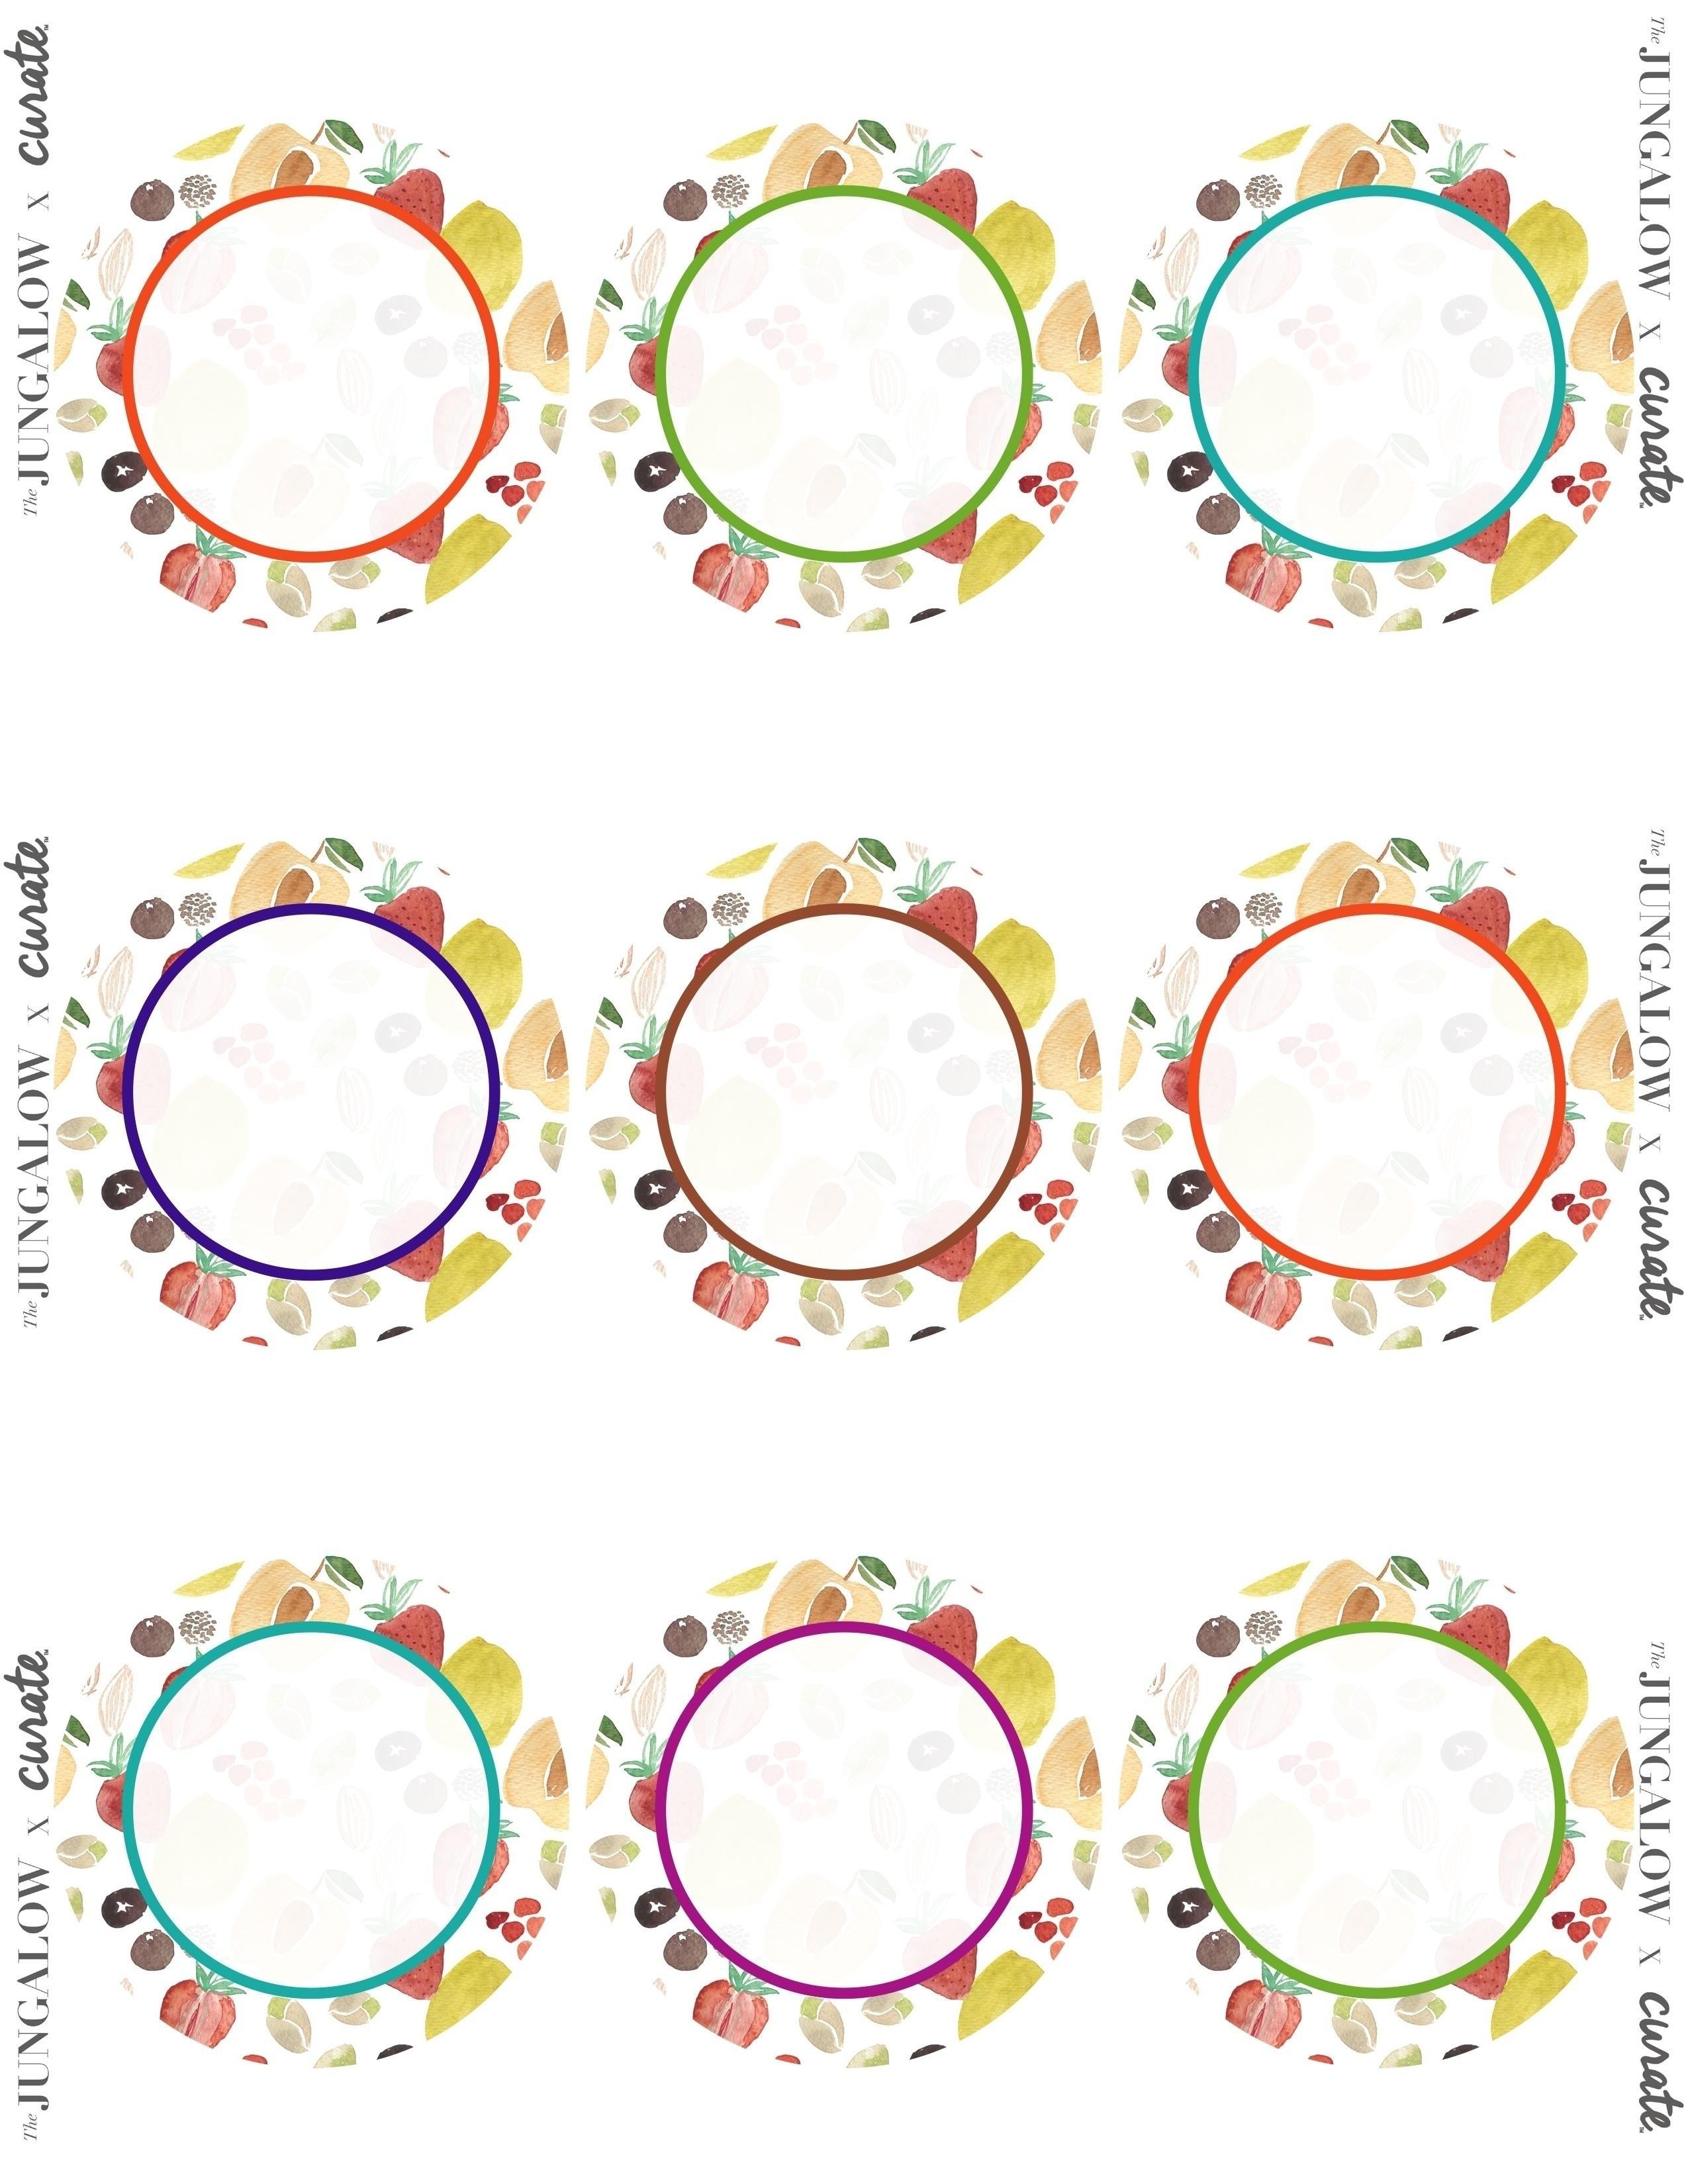 Free Printable Round Label Templates | World Of Label - Free Printable Label Templates